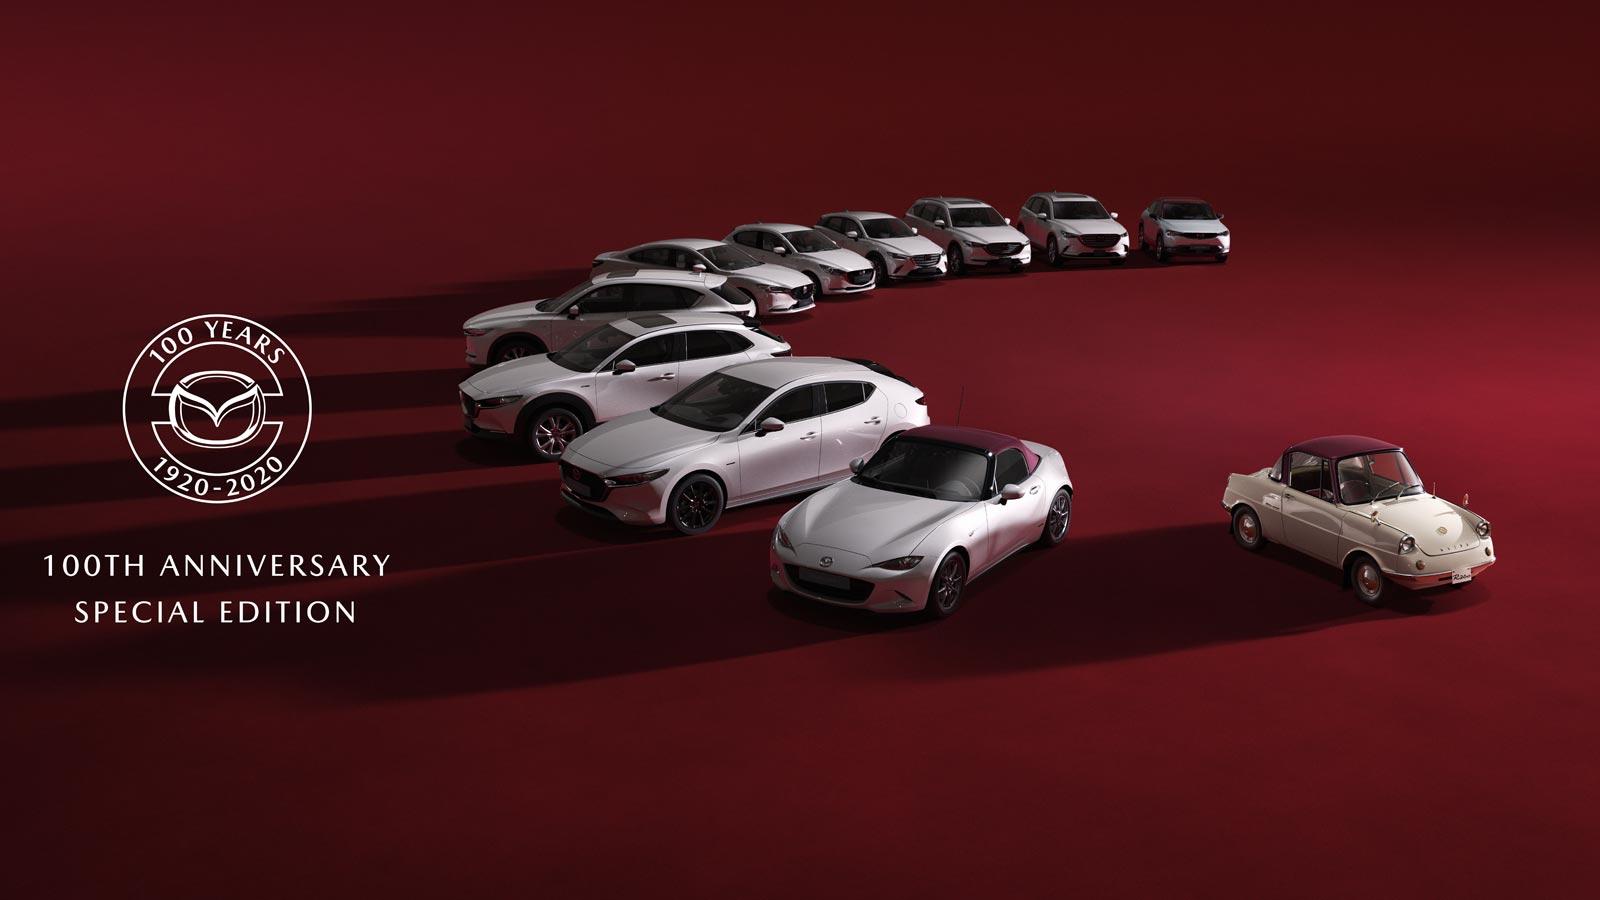 Mazda 100th Anniversary Special Edition Series